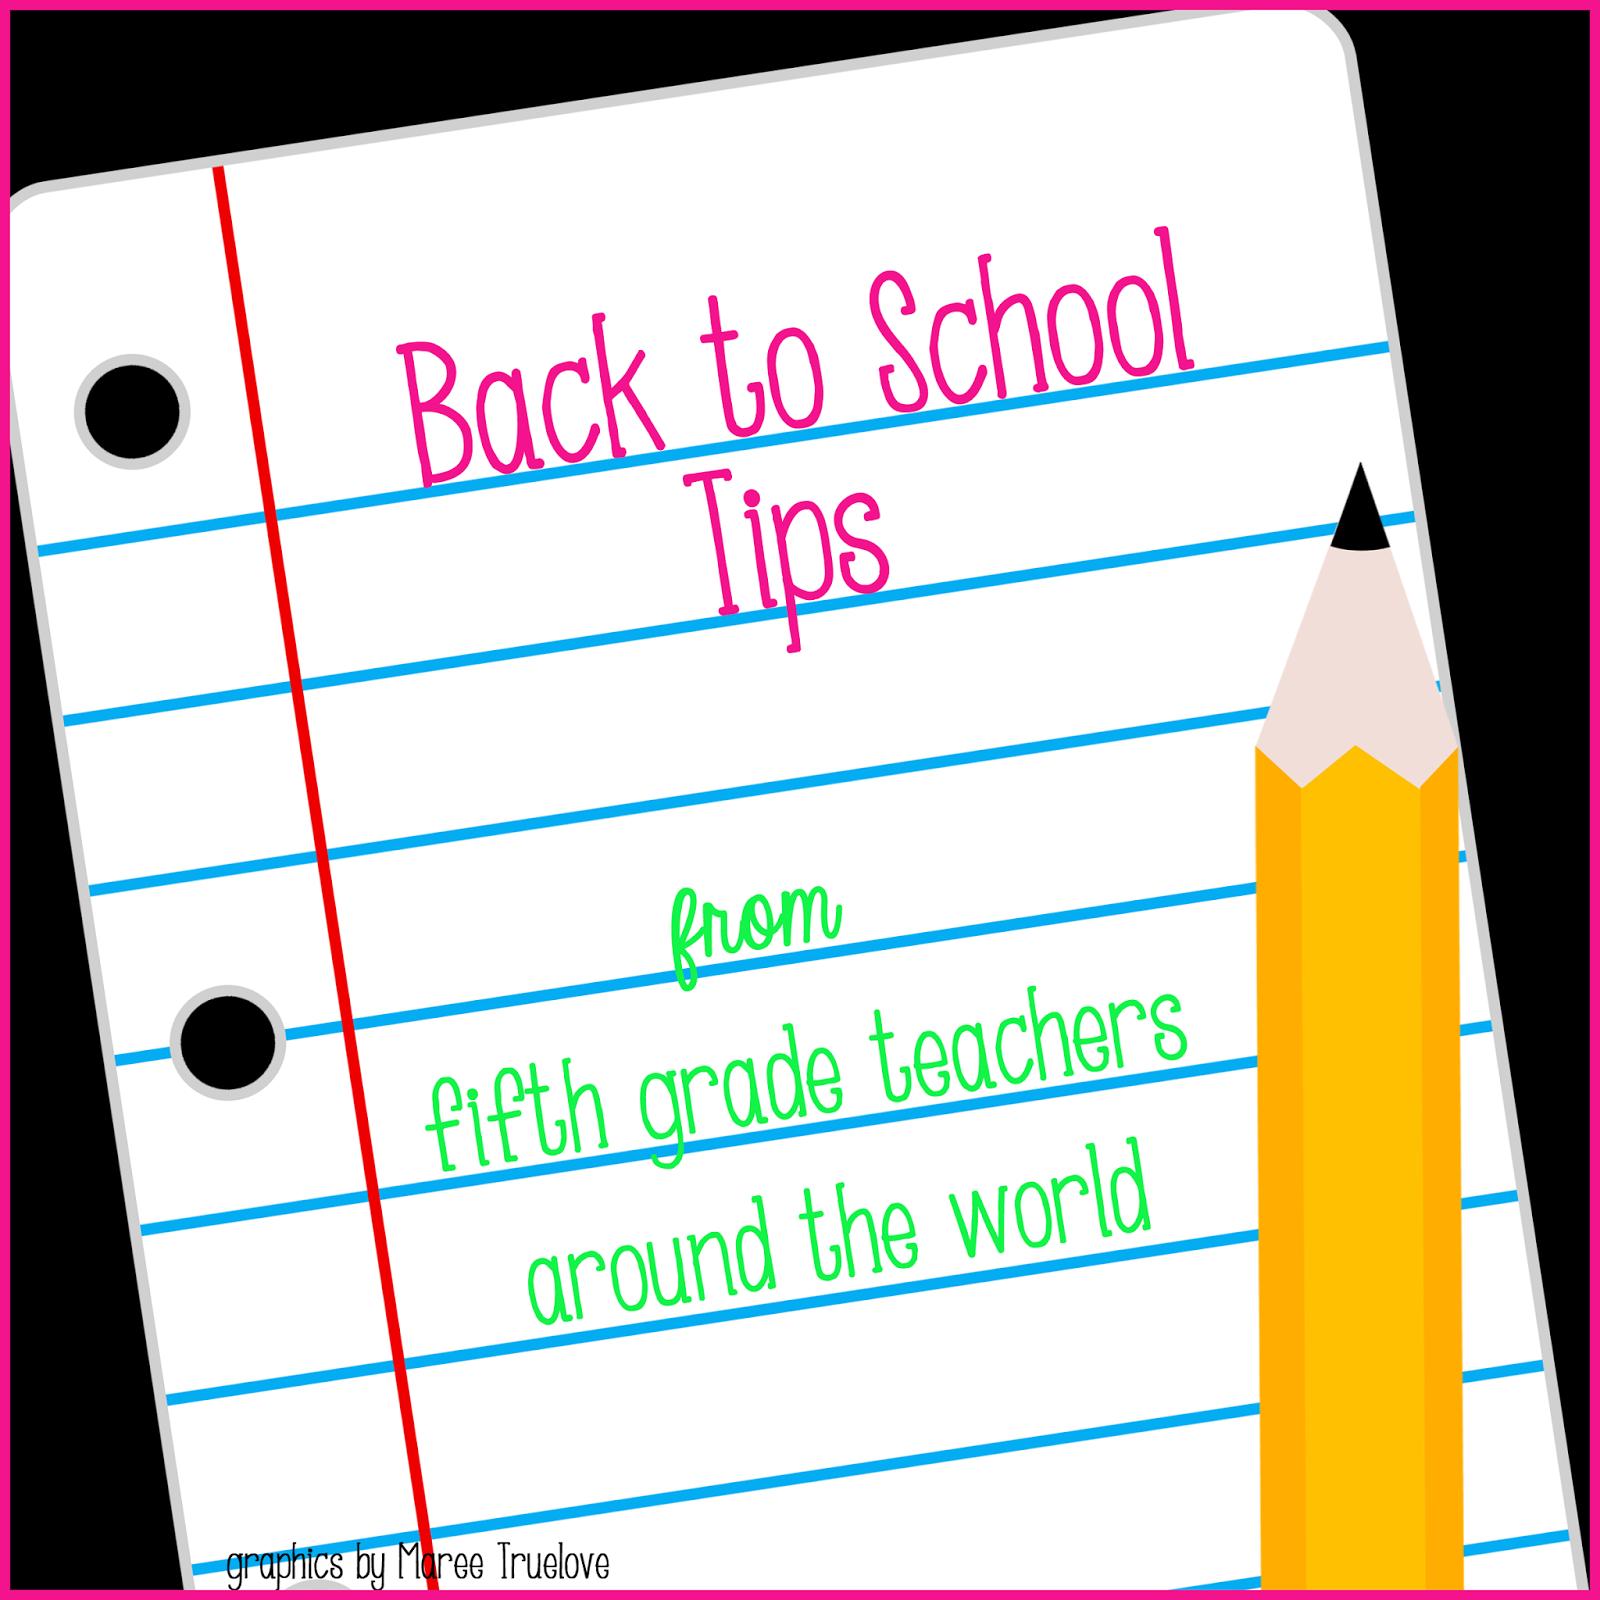 Teachingisa T Fifth Grade Fanatics Back To School Blog Hop